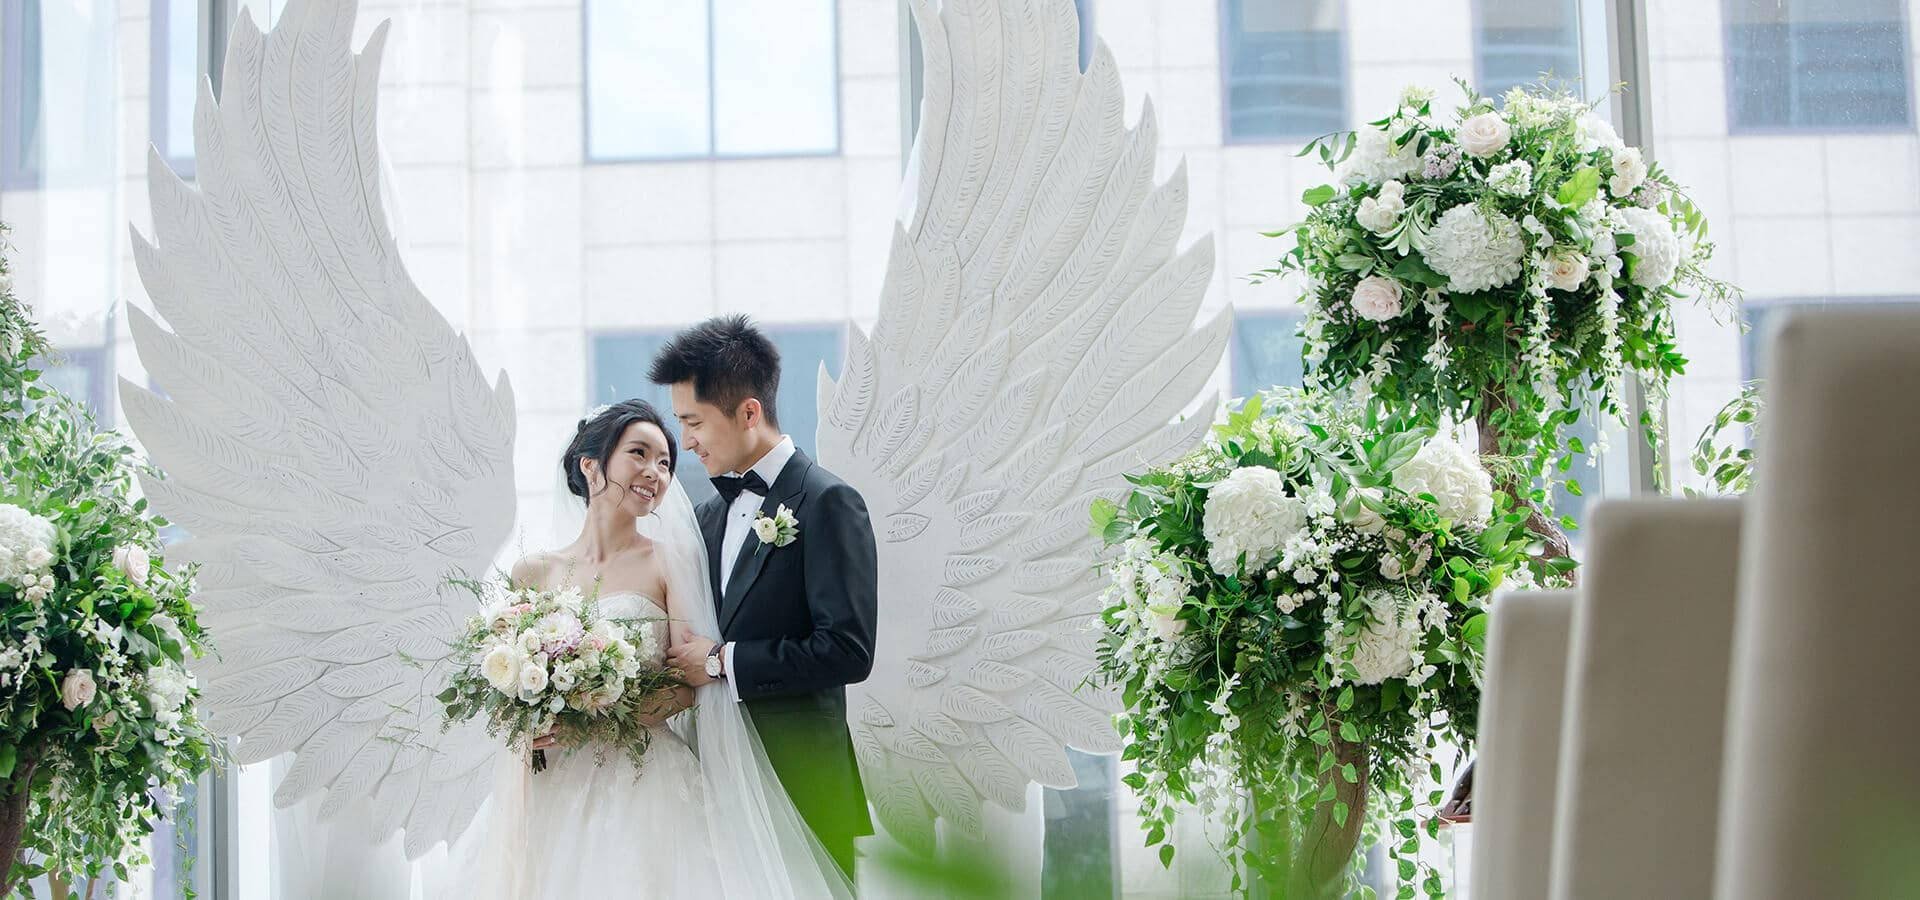 Hero image for Olivia and Ben's Enchanting Wedding at the Shangri-La Hotel